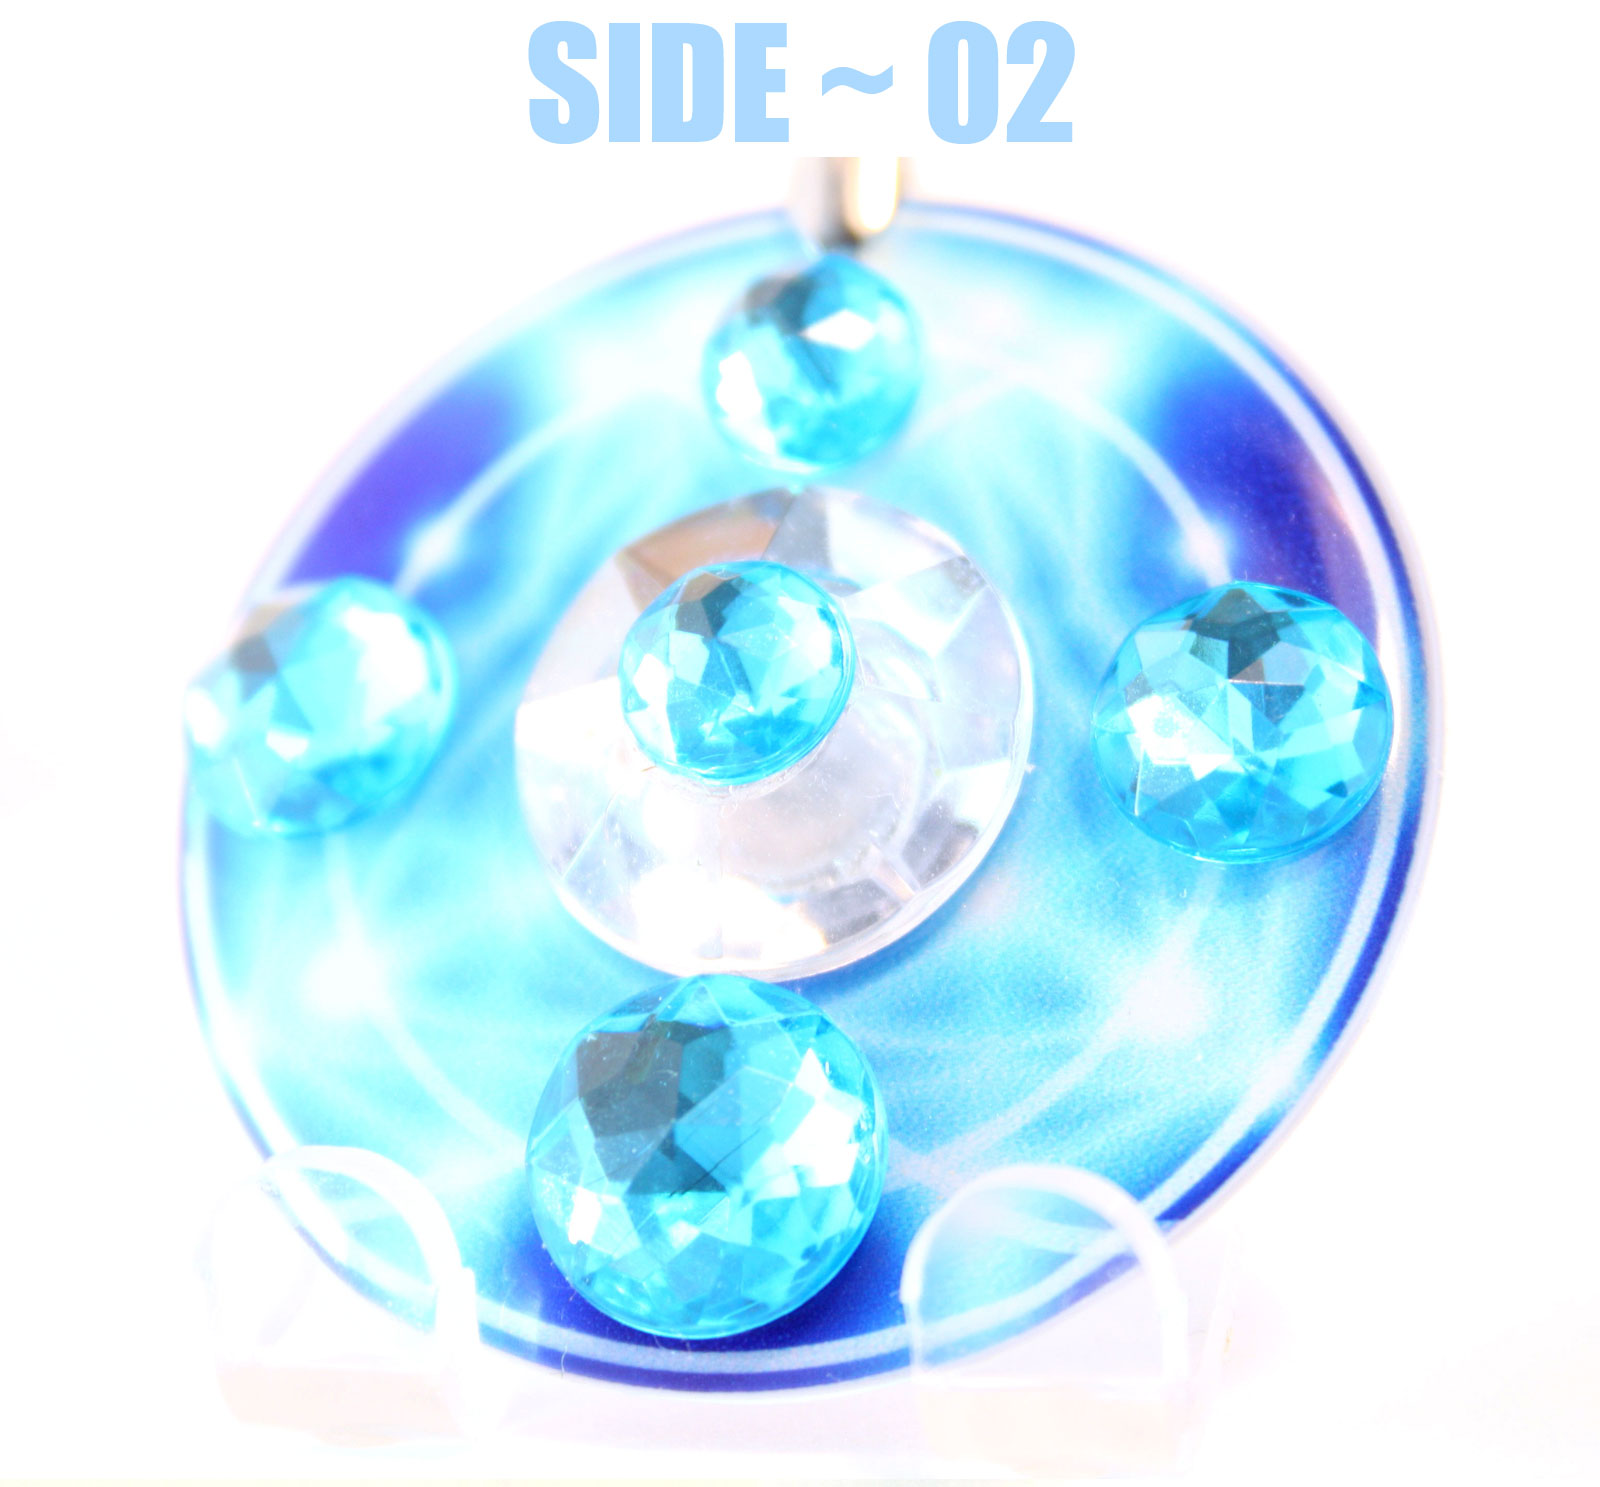 trinity-guardian-02b